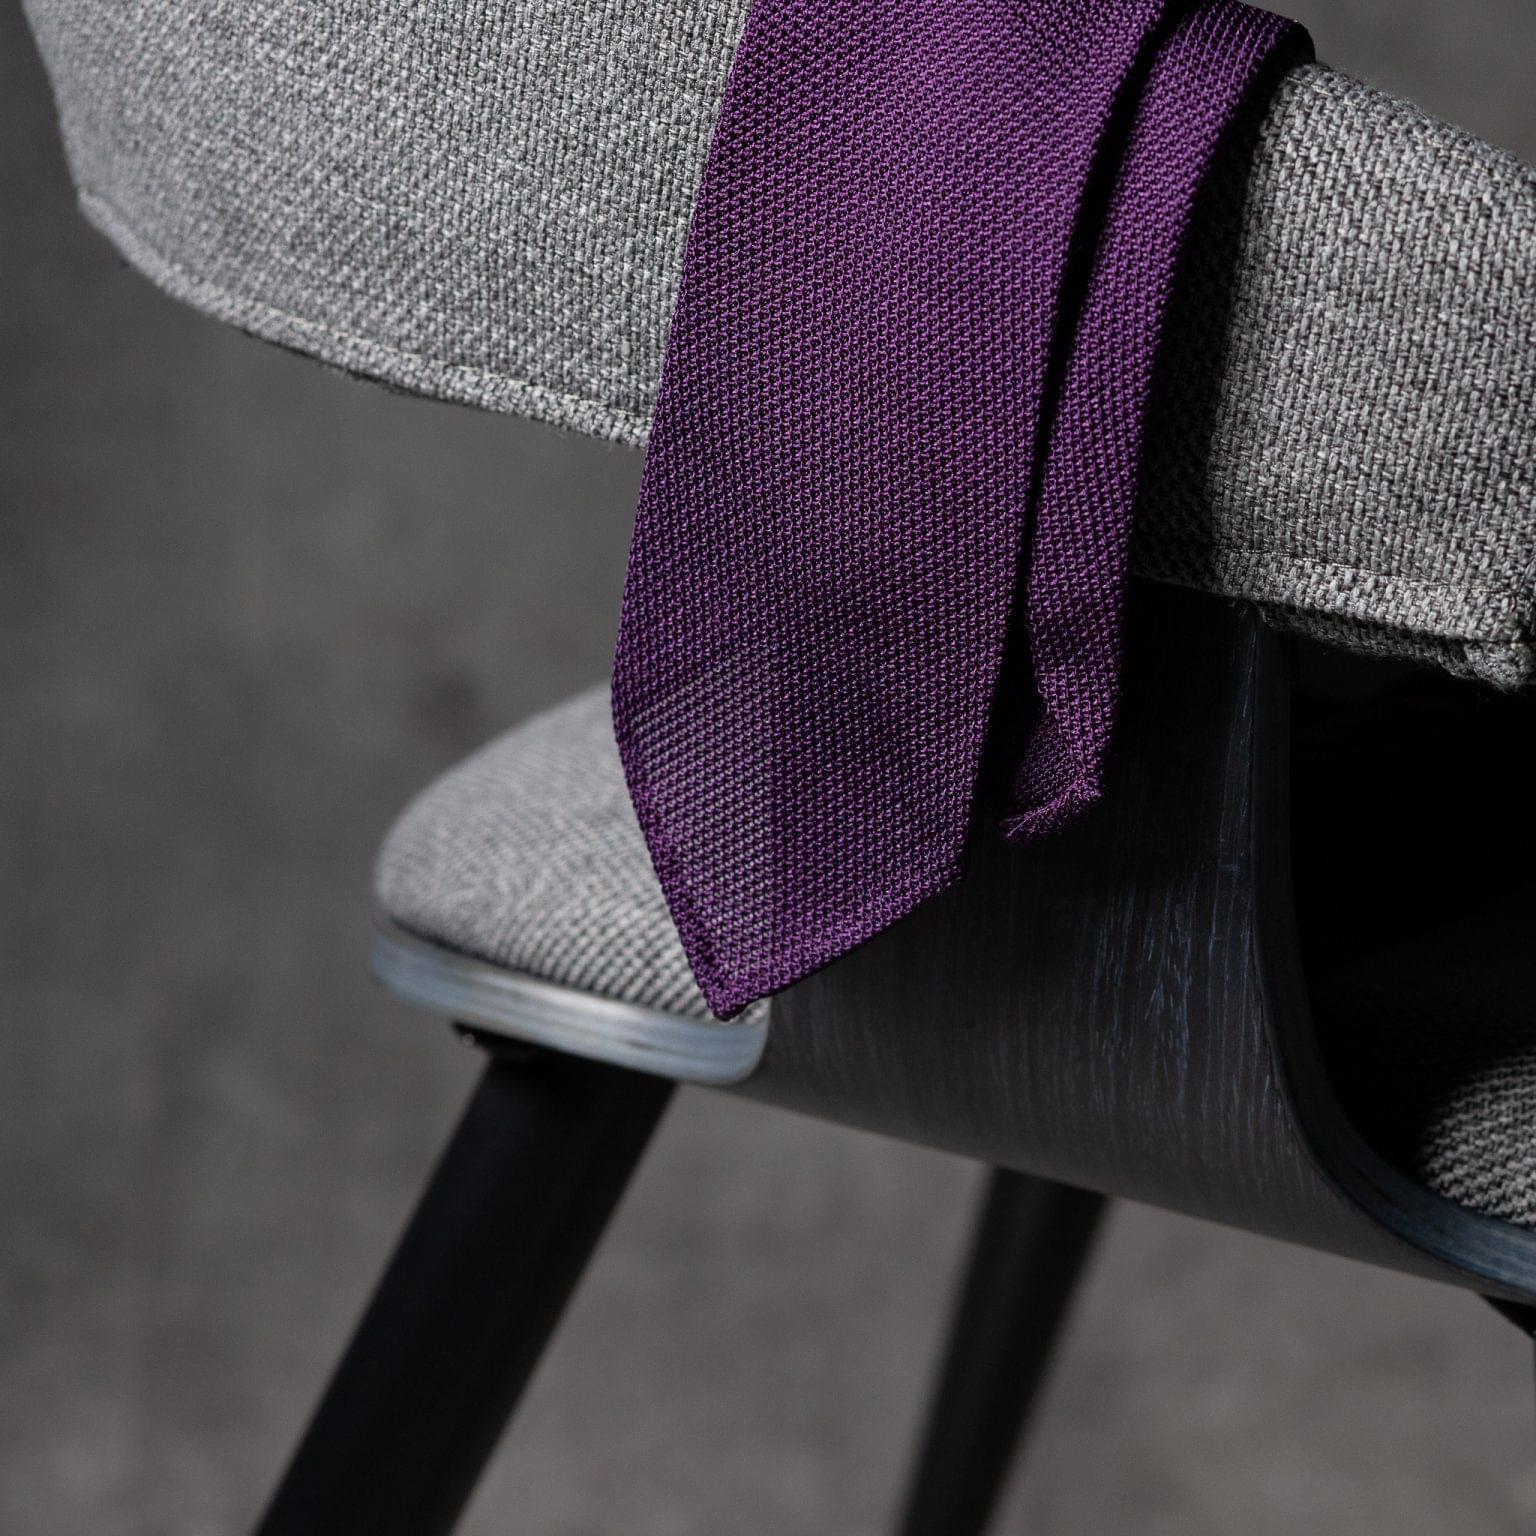 GRENADINE-0157-Tie-Initials-Corbata-Iniciales-The-Seelk-2